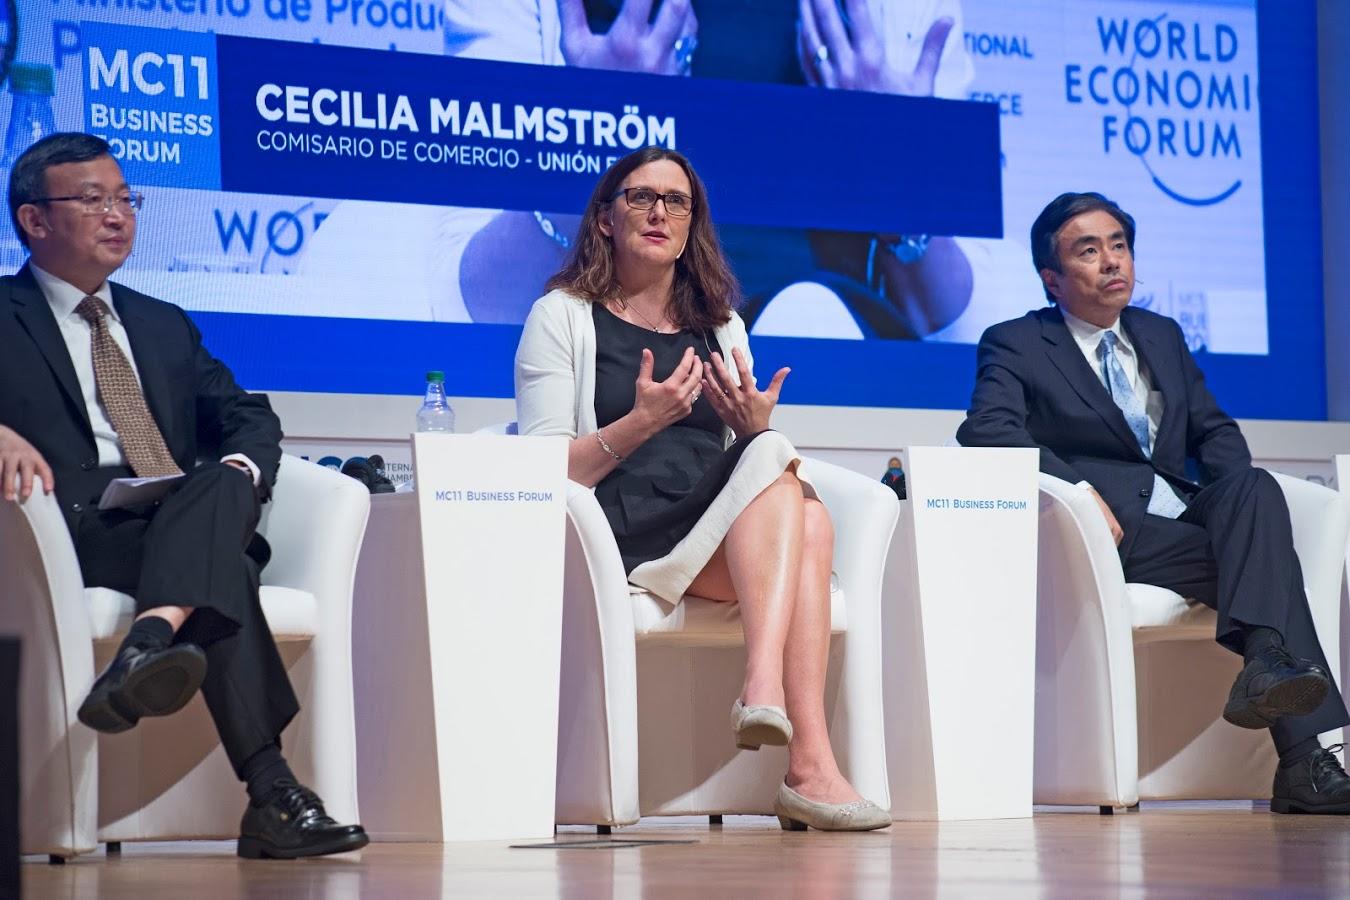 Cecilia Malmstroem - © European Union, 2017 / Photo: Erika Villano